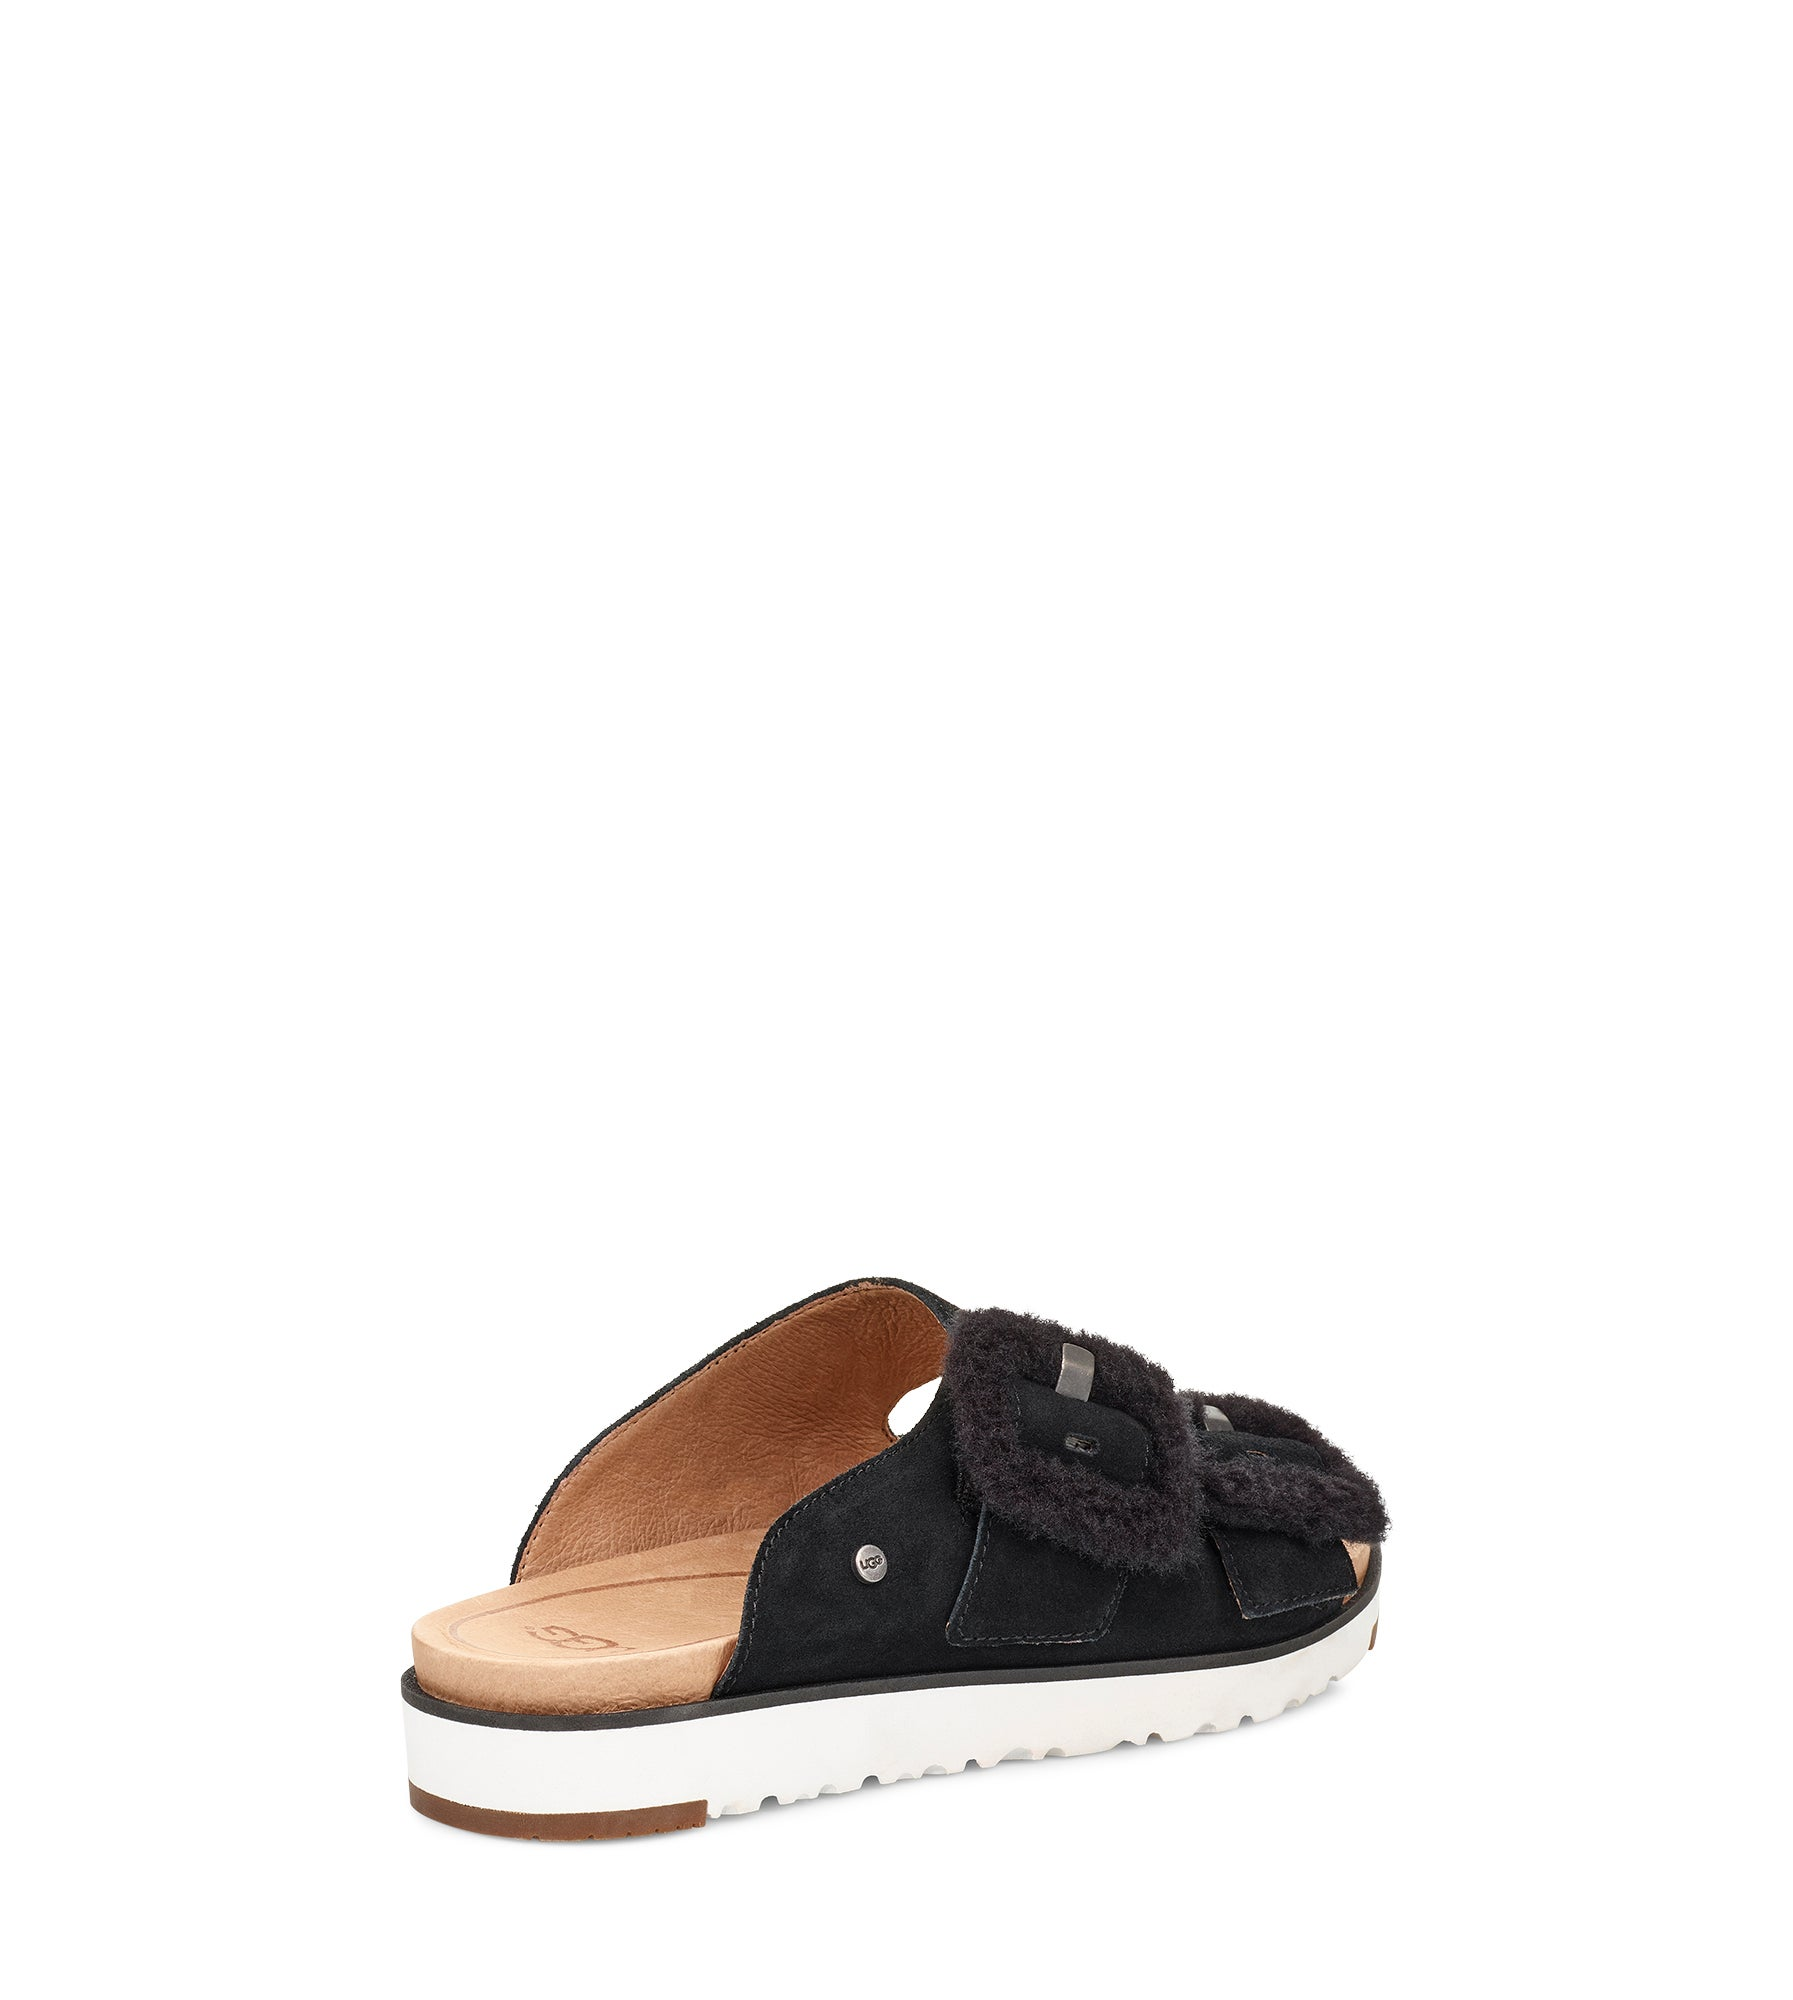 Sandale à enfiler Fluff Indio, noir, fem